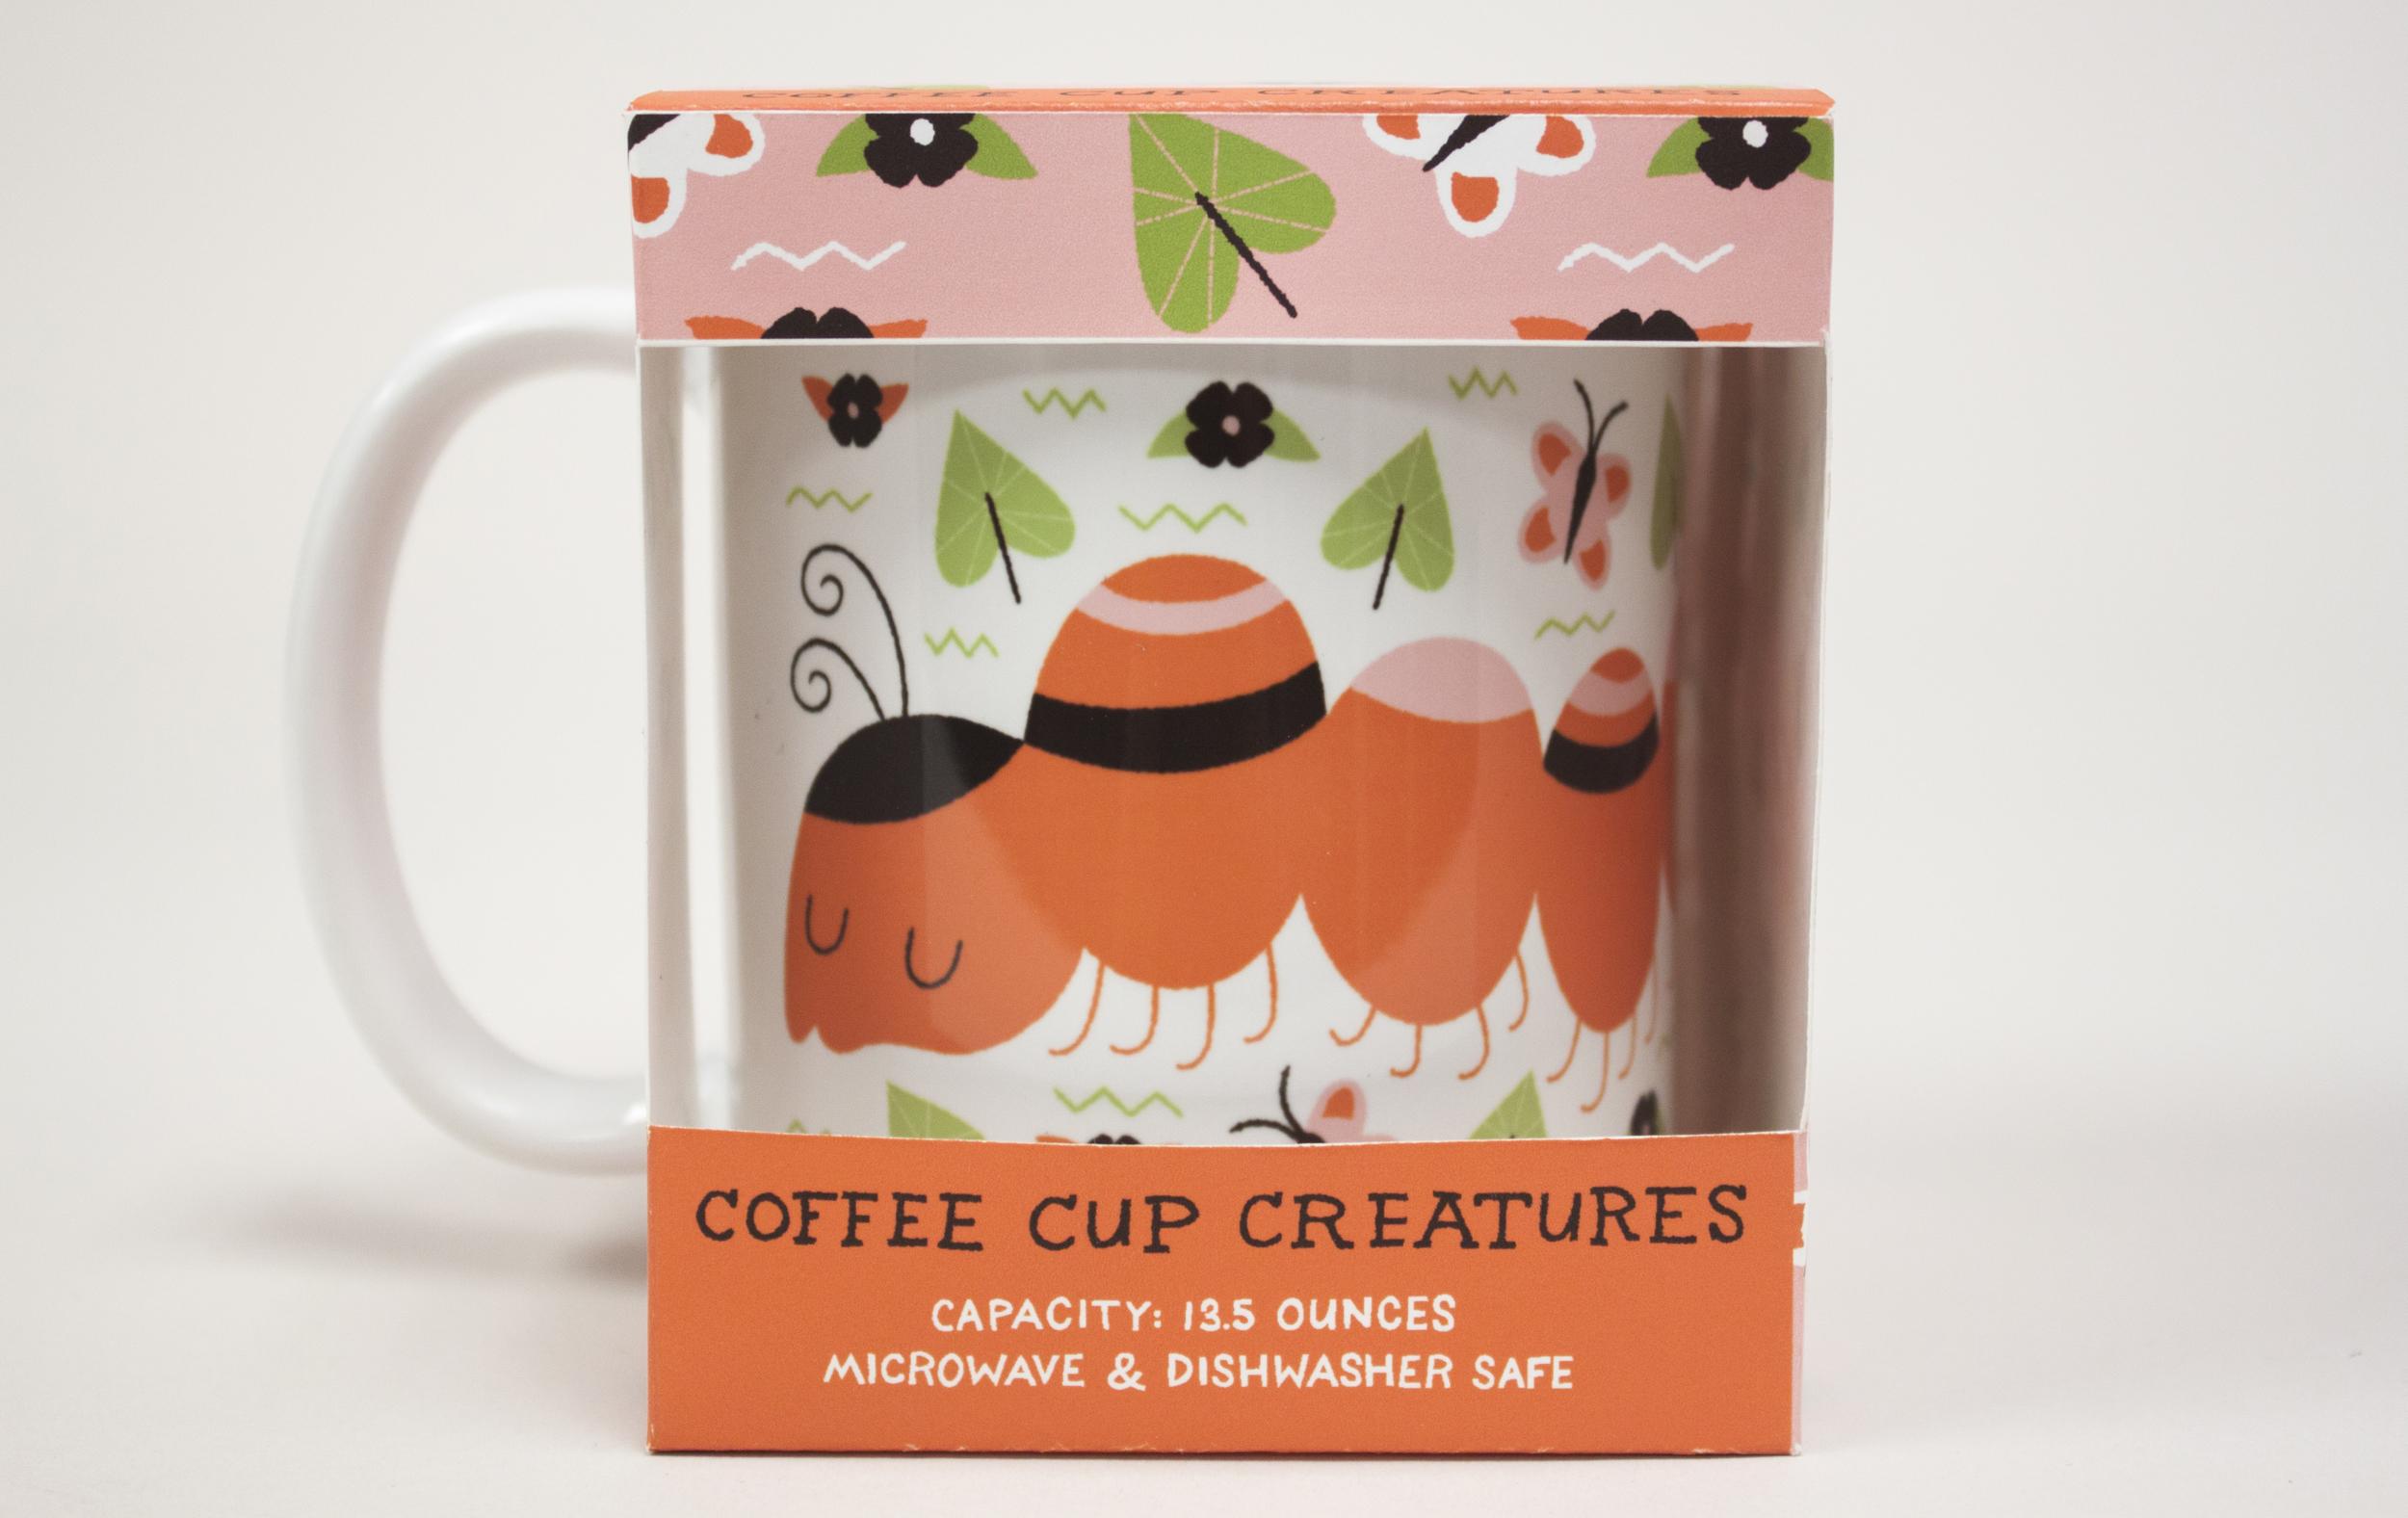 coffee_cup_creatures_3.jpg